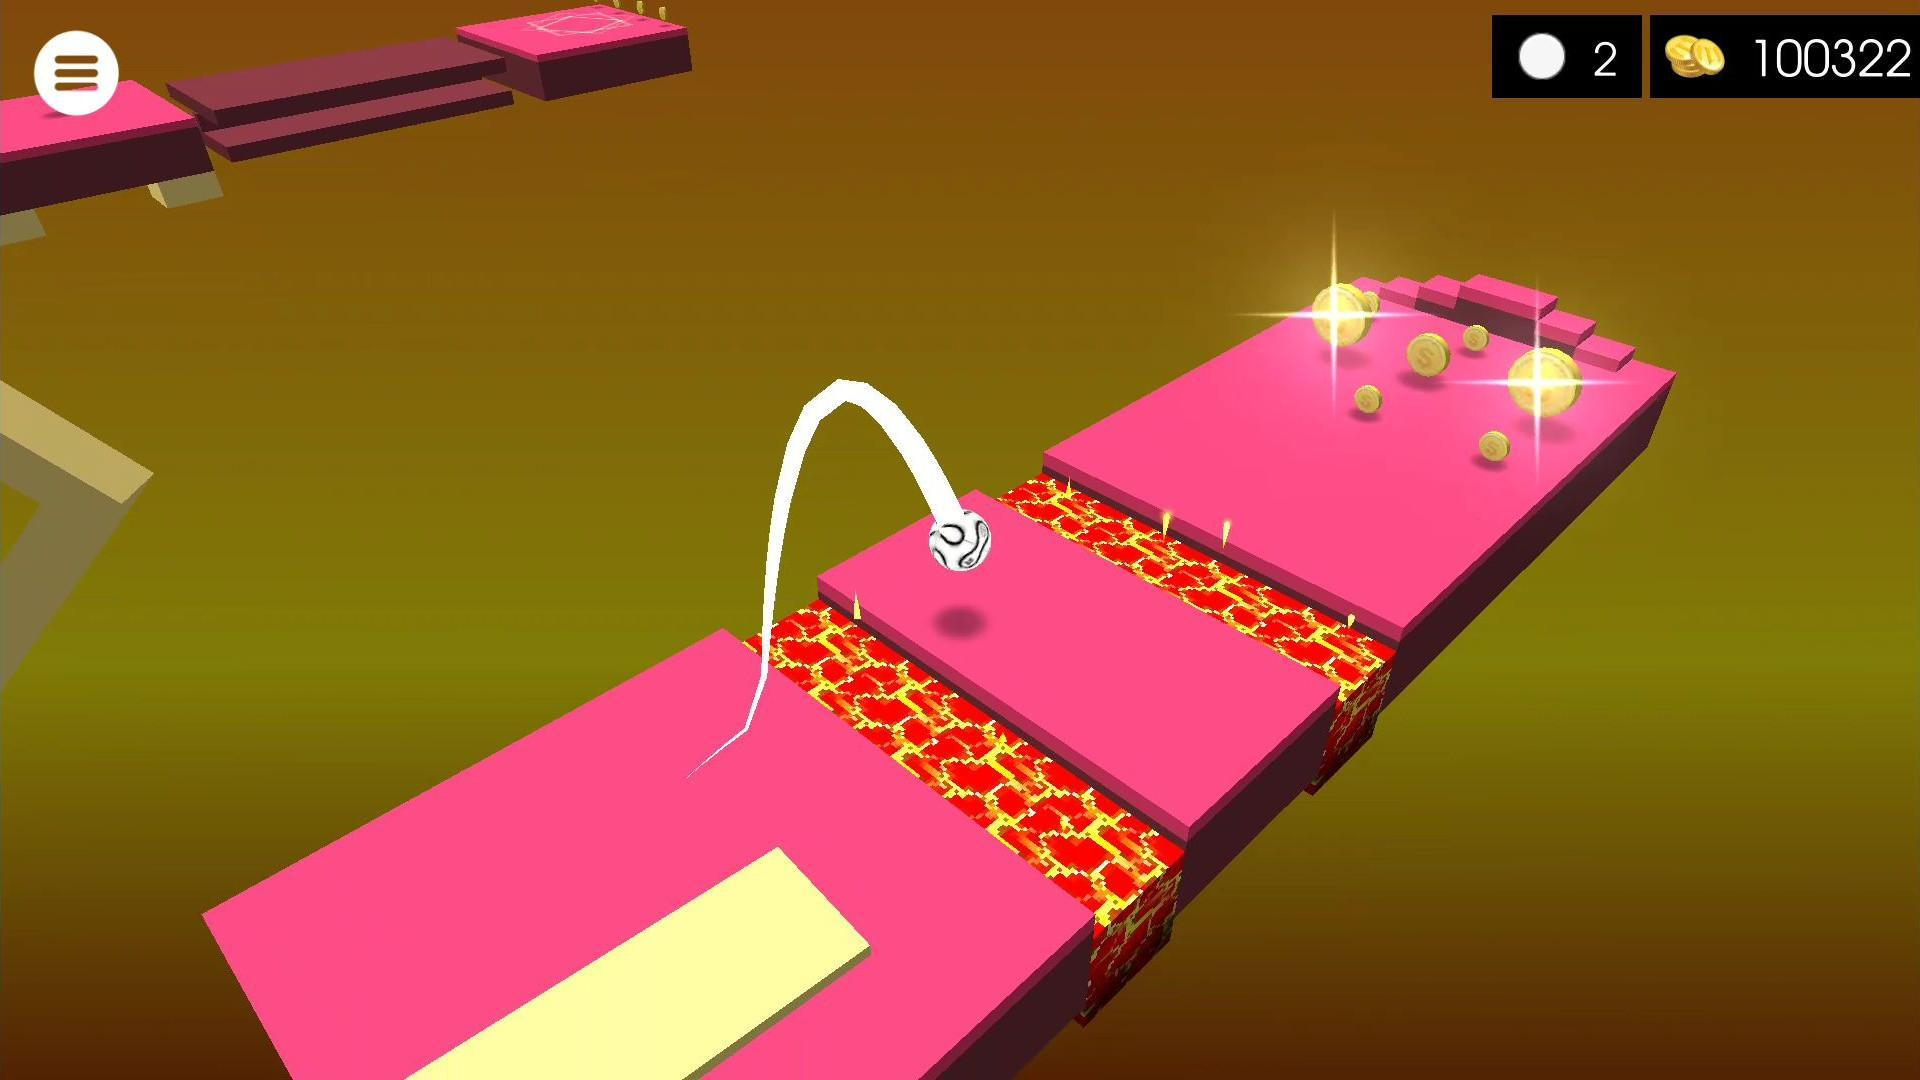 RYWO free 3D roll ball game 1.2.3 Screenshot 10